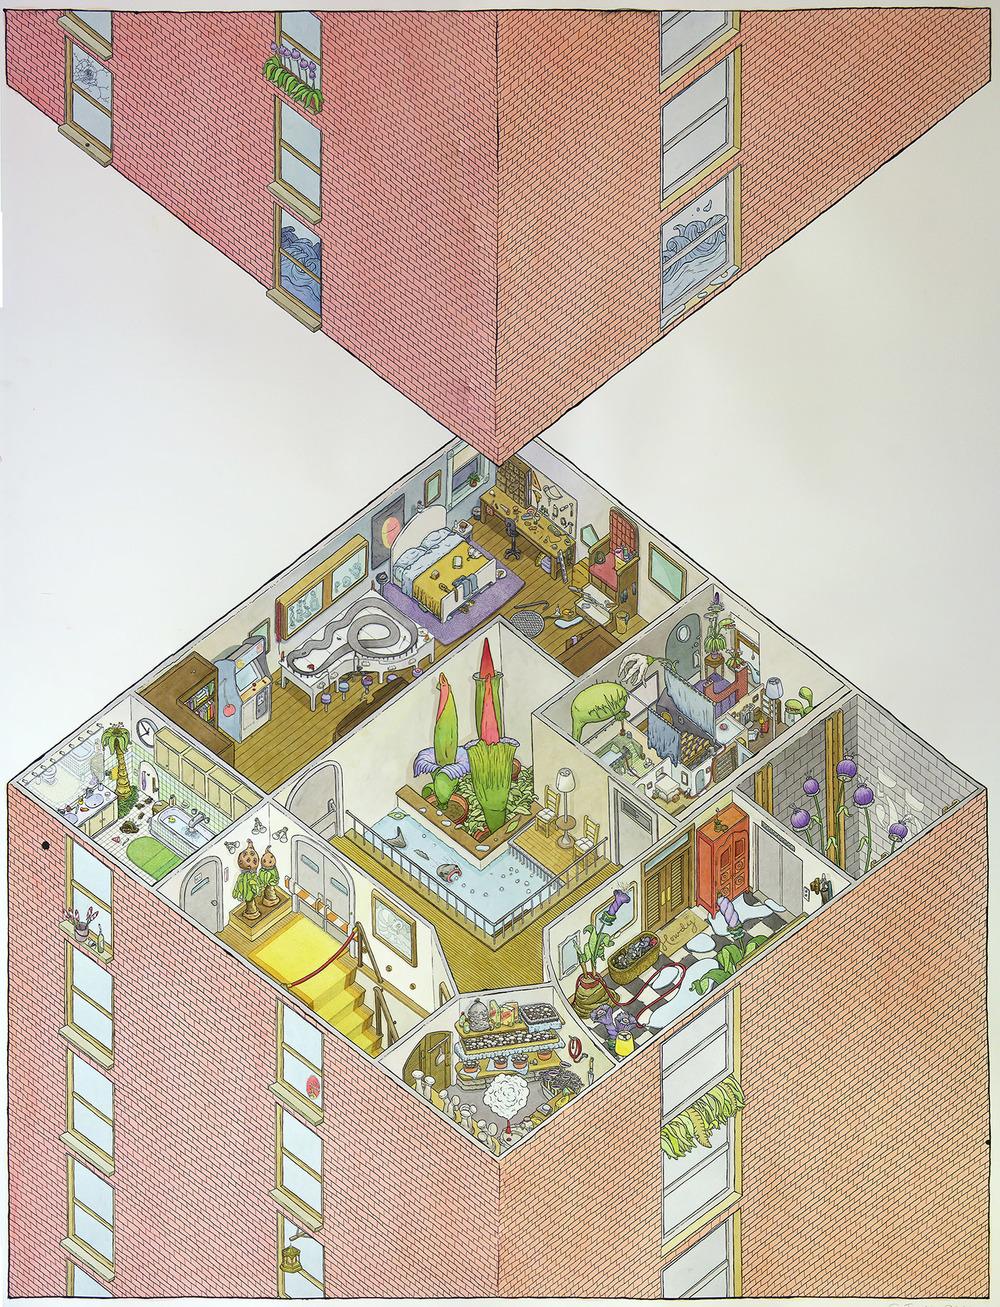 55th Floor